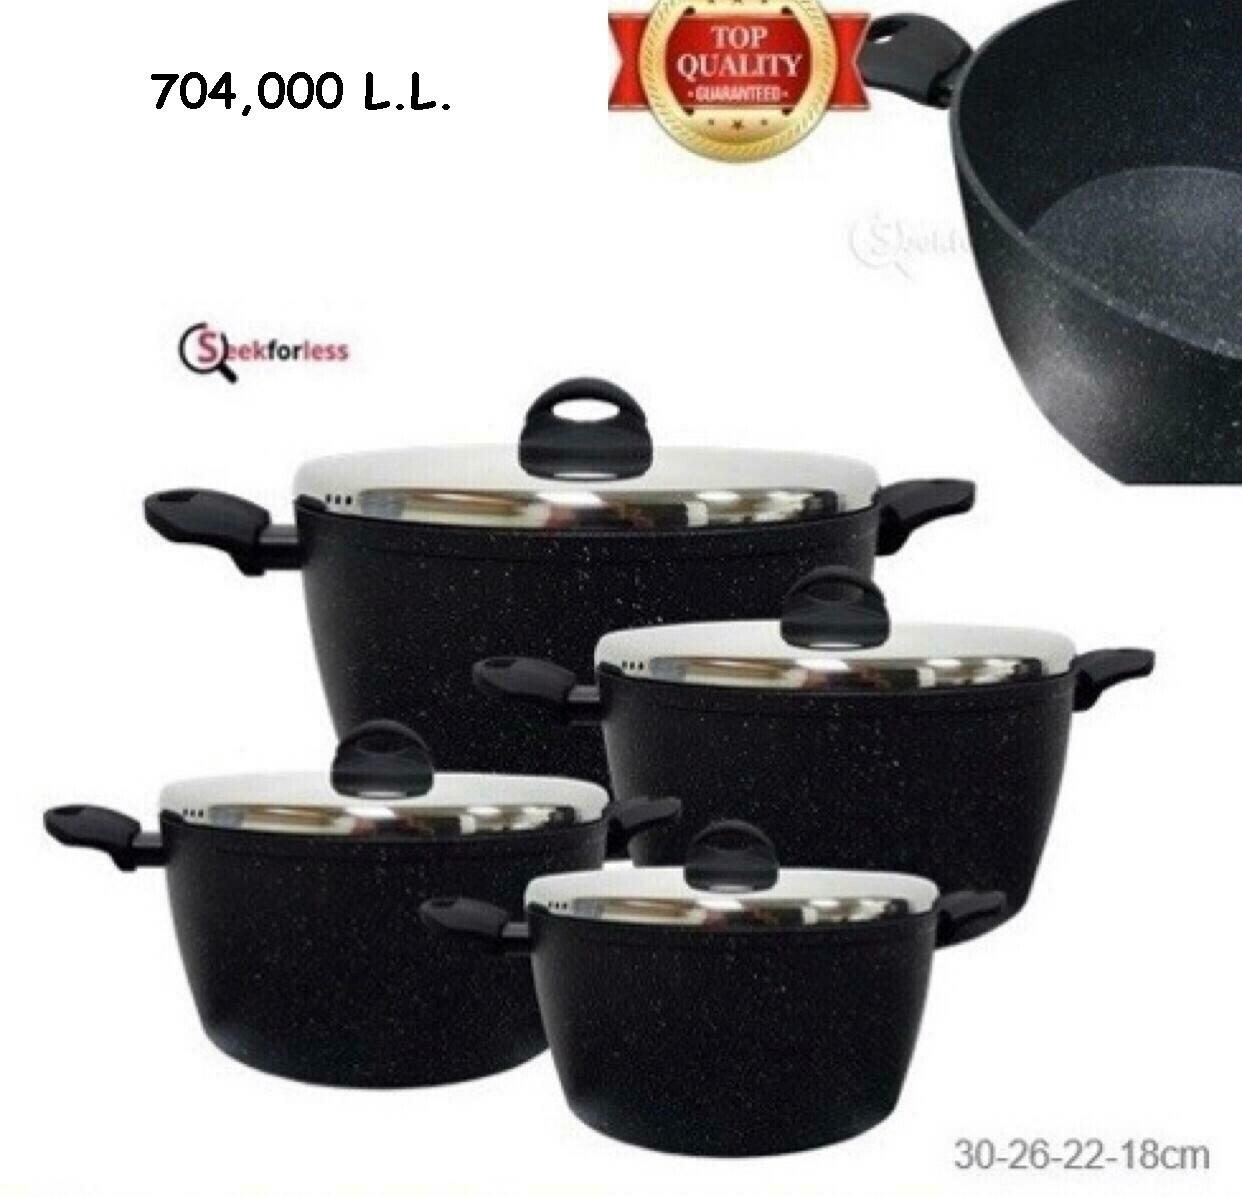 Cookware Set - Black